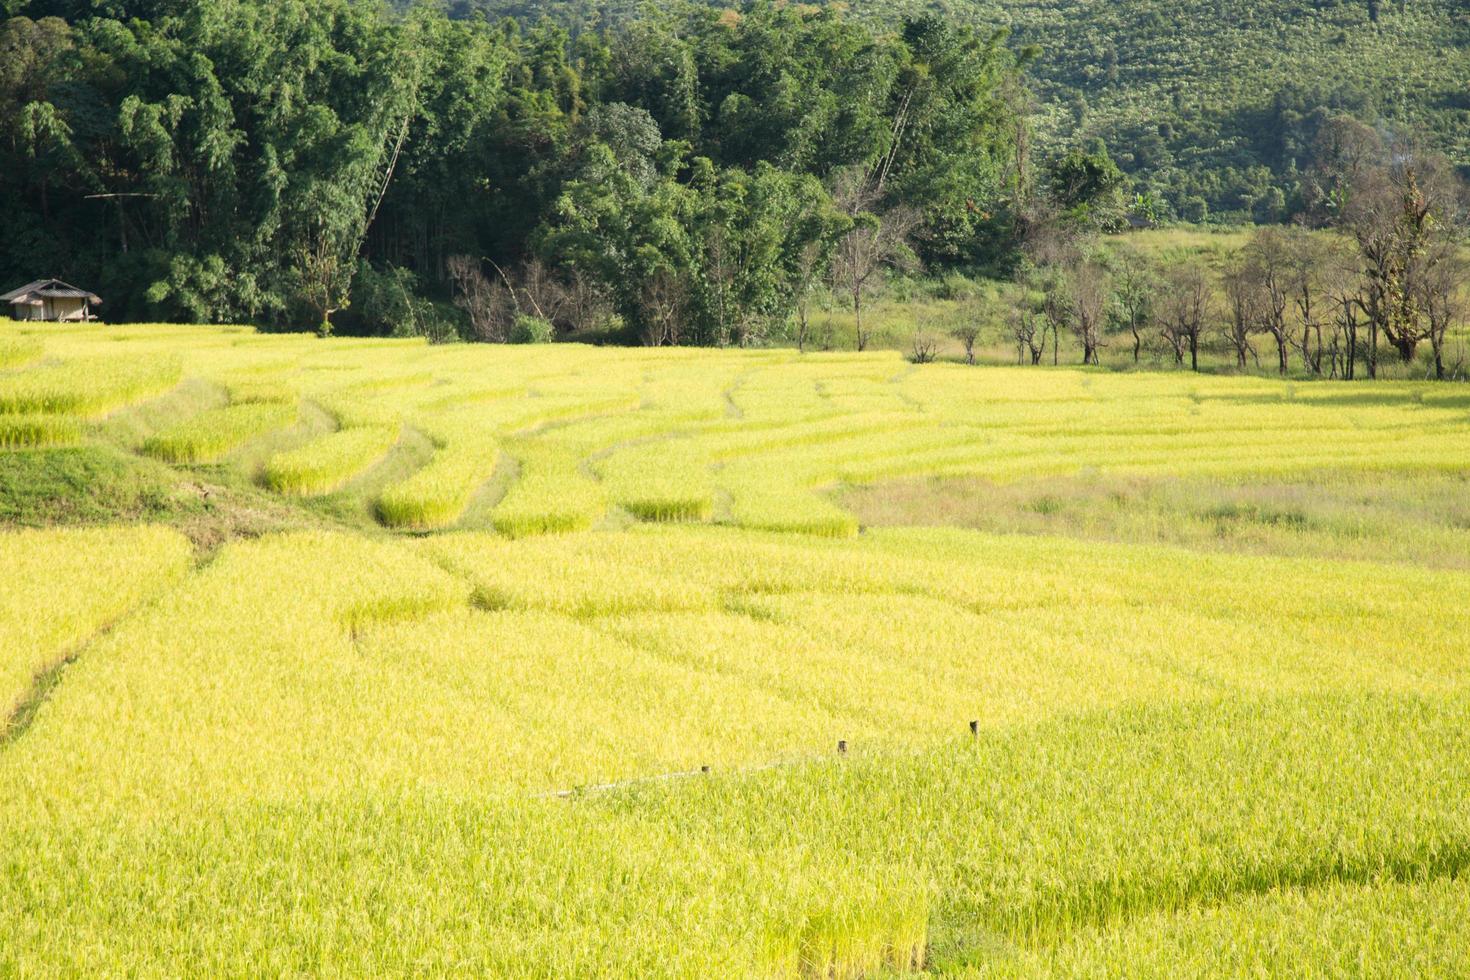 Reisfarm auf dem Berg in Thailand foto